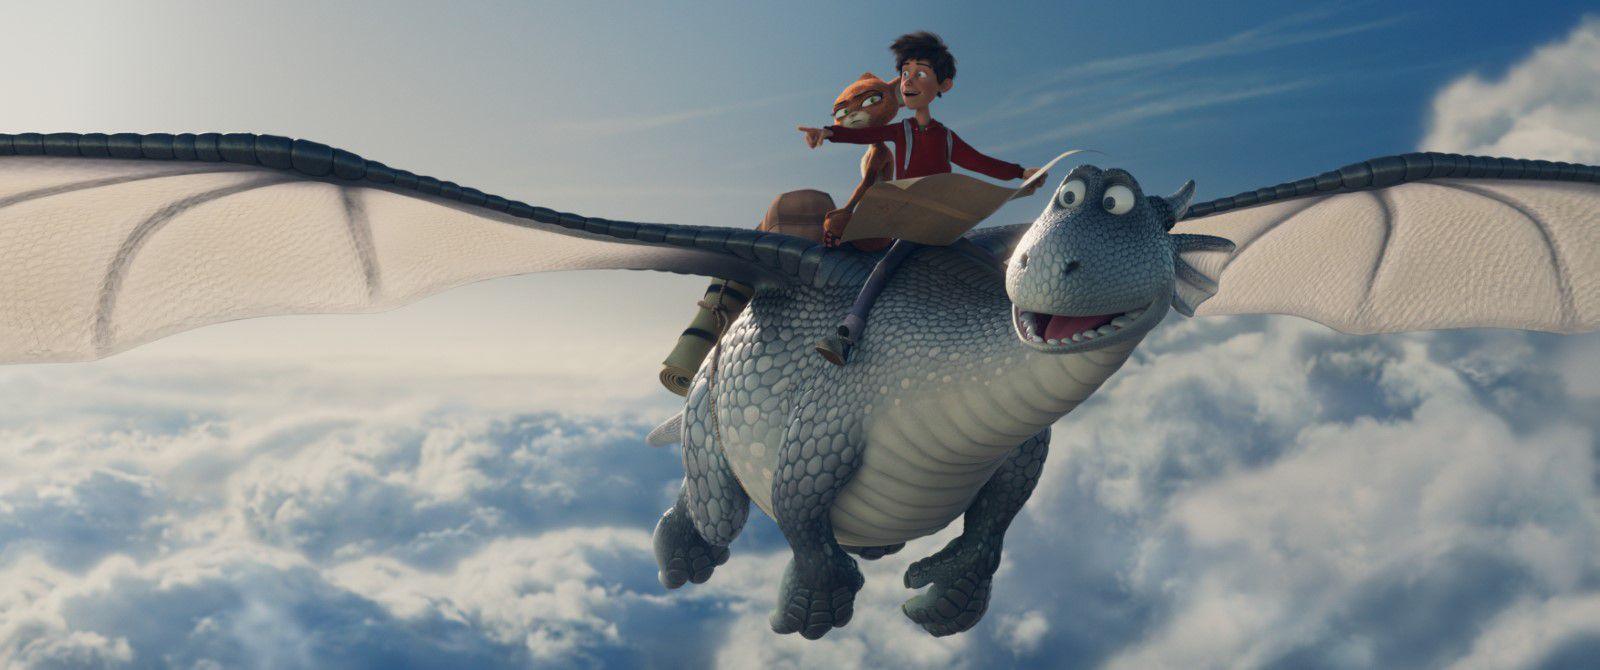 Dragon Rider (BANDE-ANNONCE) avec les voix de Felicity Jones, Freddie Highmore, Patrick Stewart